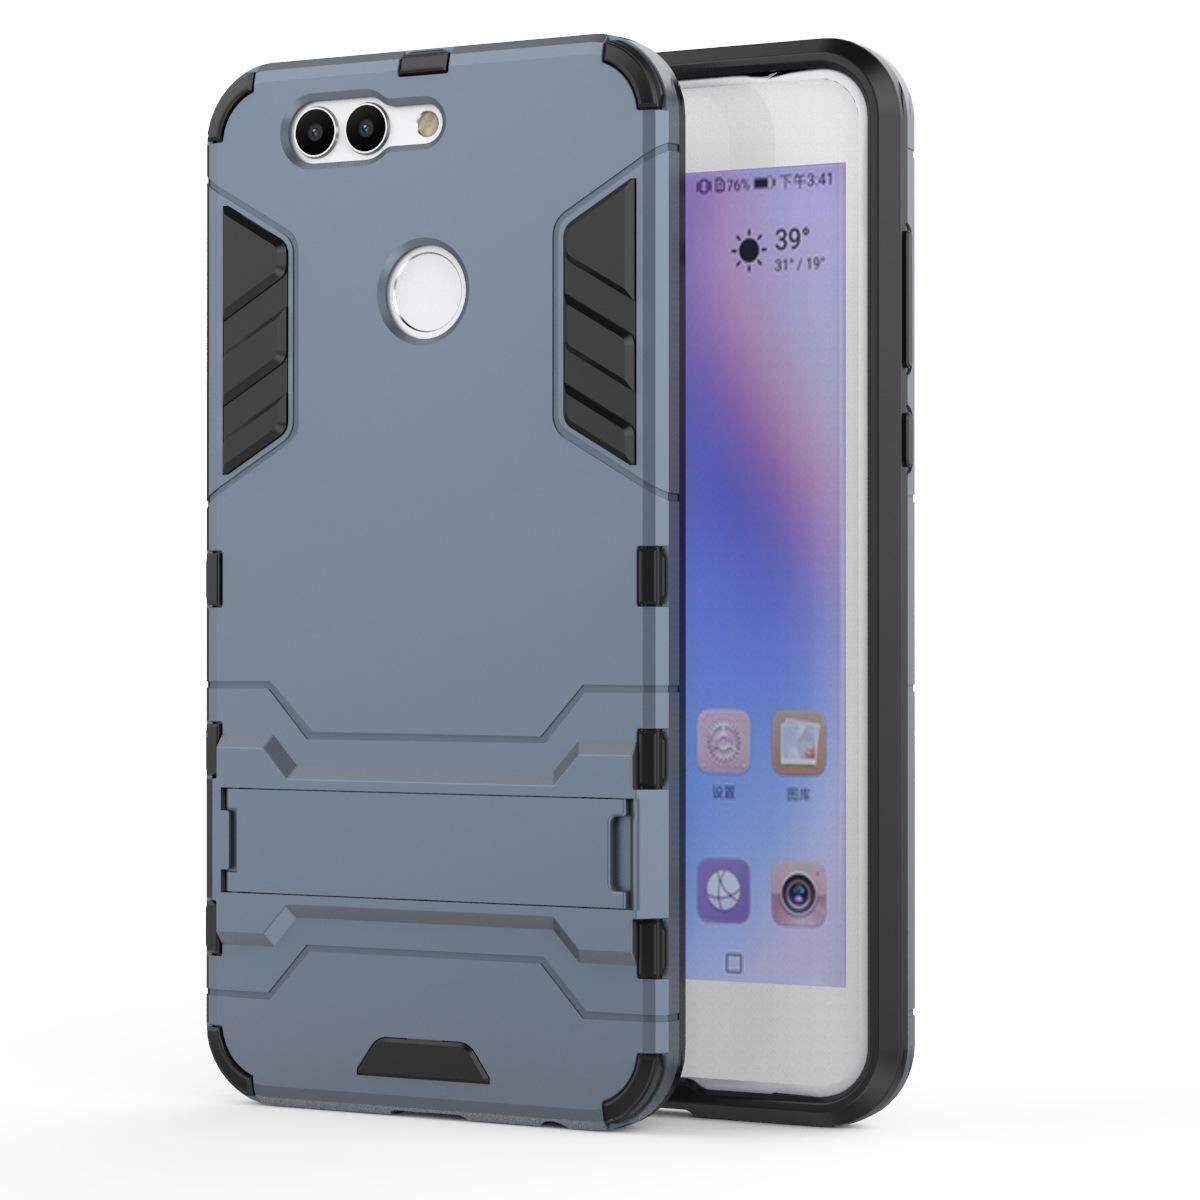 Hình ảnh for Huawei Nova 2 Plus Case 2in1 PC+TPU Hybrid Slim Back Case Ultra Thin Armor Cover, with Kickstand Holder, Glossy, Minimalist, Casual